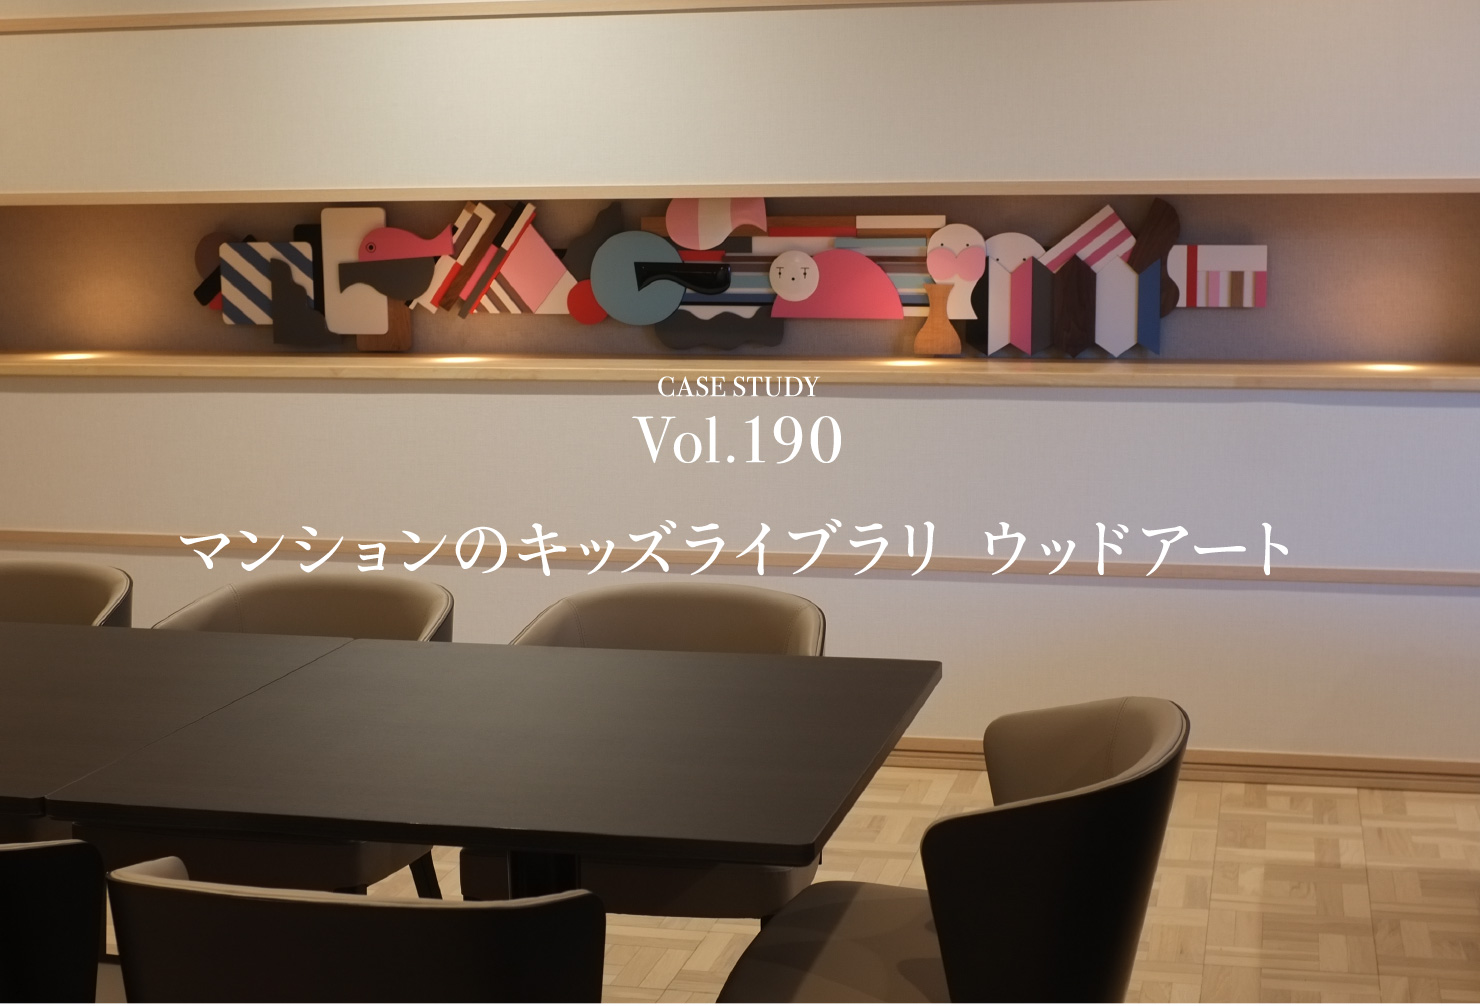 CASE STUDY Vol.190 マンションのキッズライブラリ ウッドアート